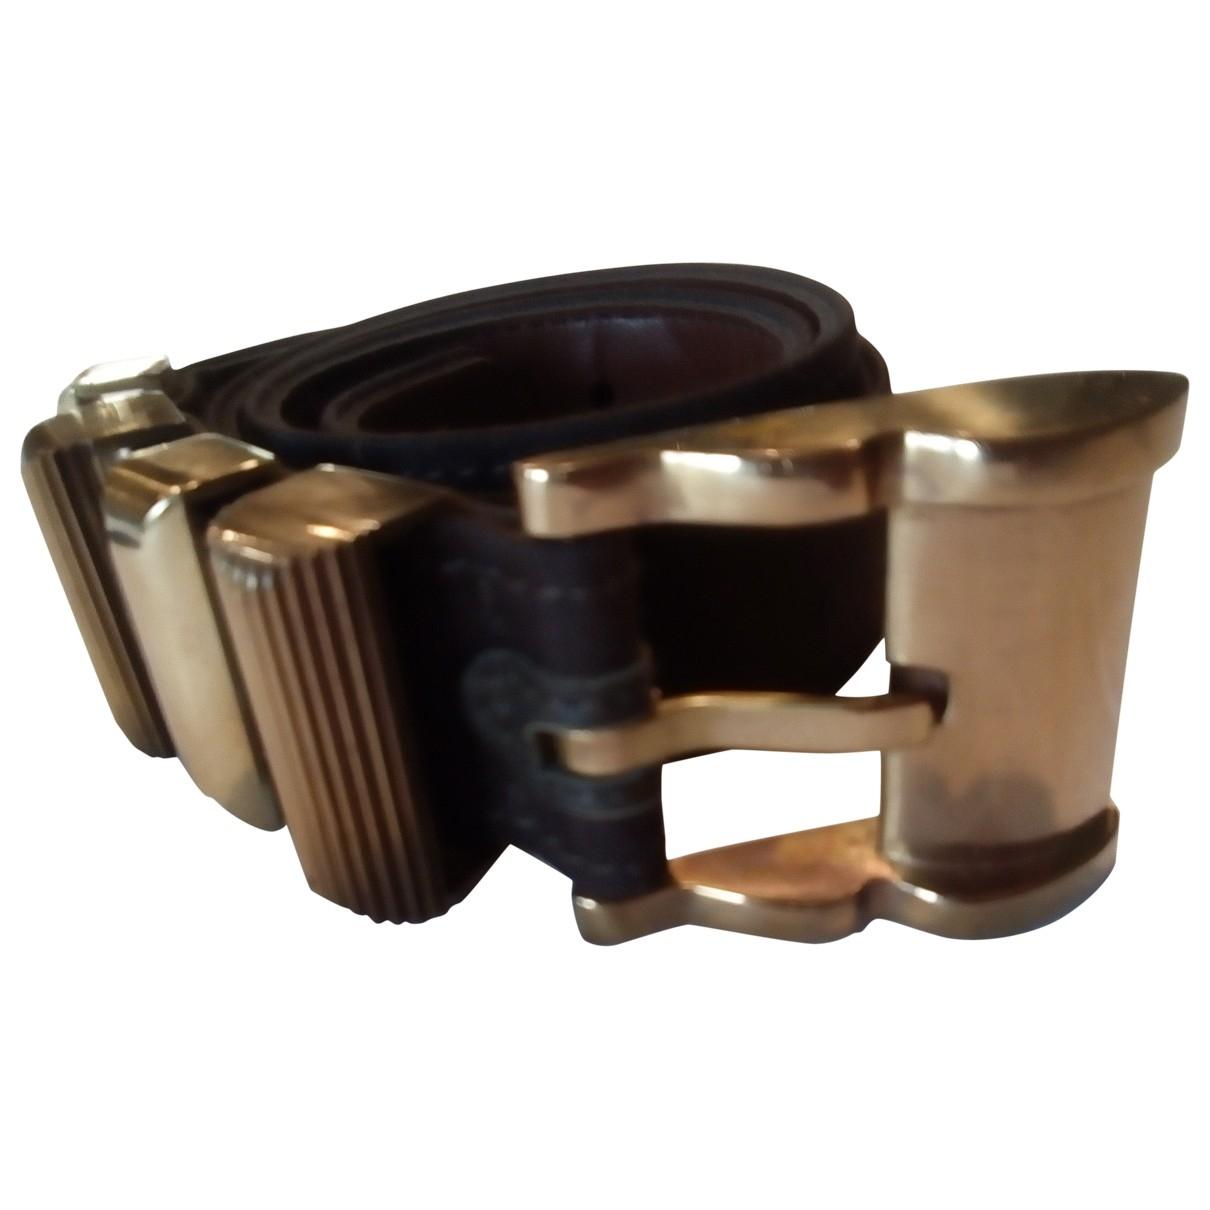 Cinturon de Seda Gianni Versace